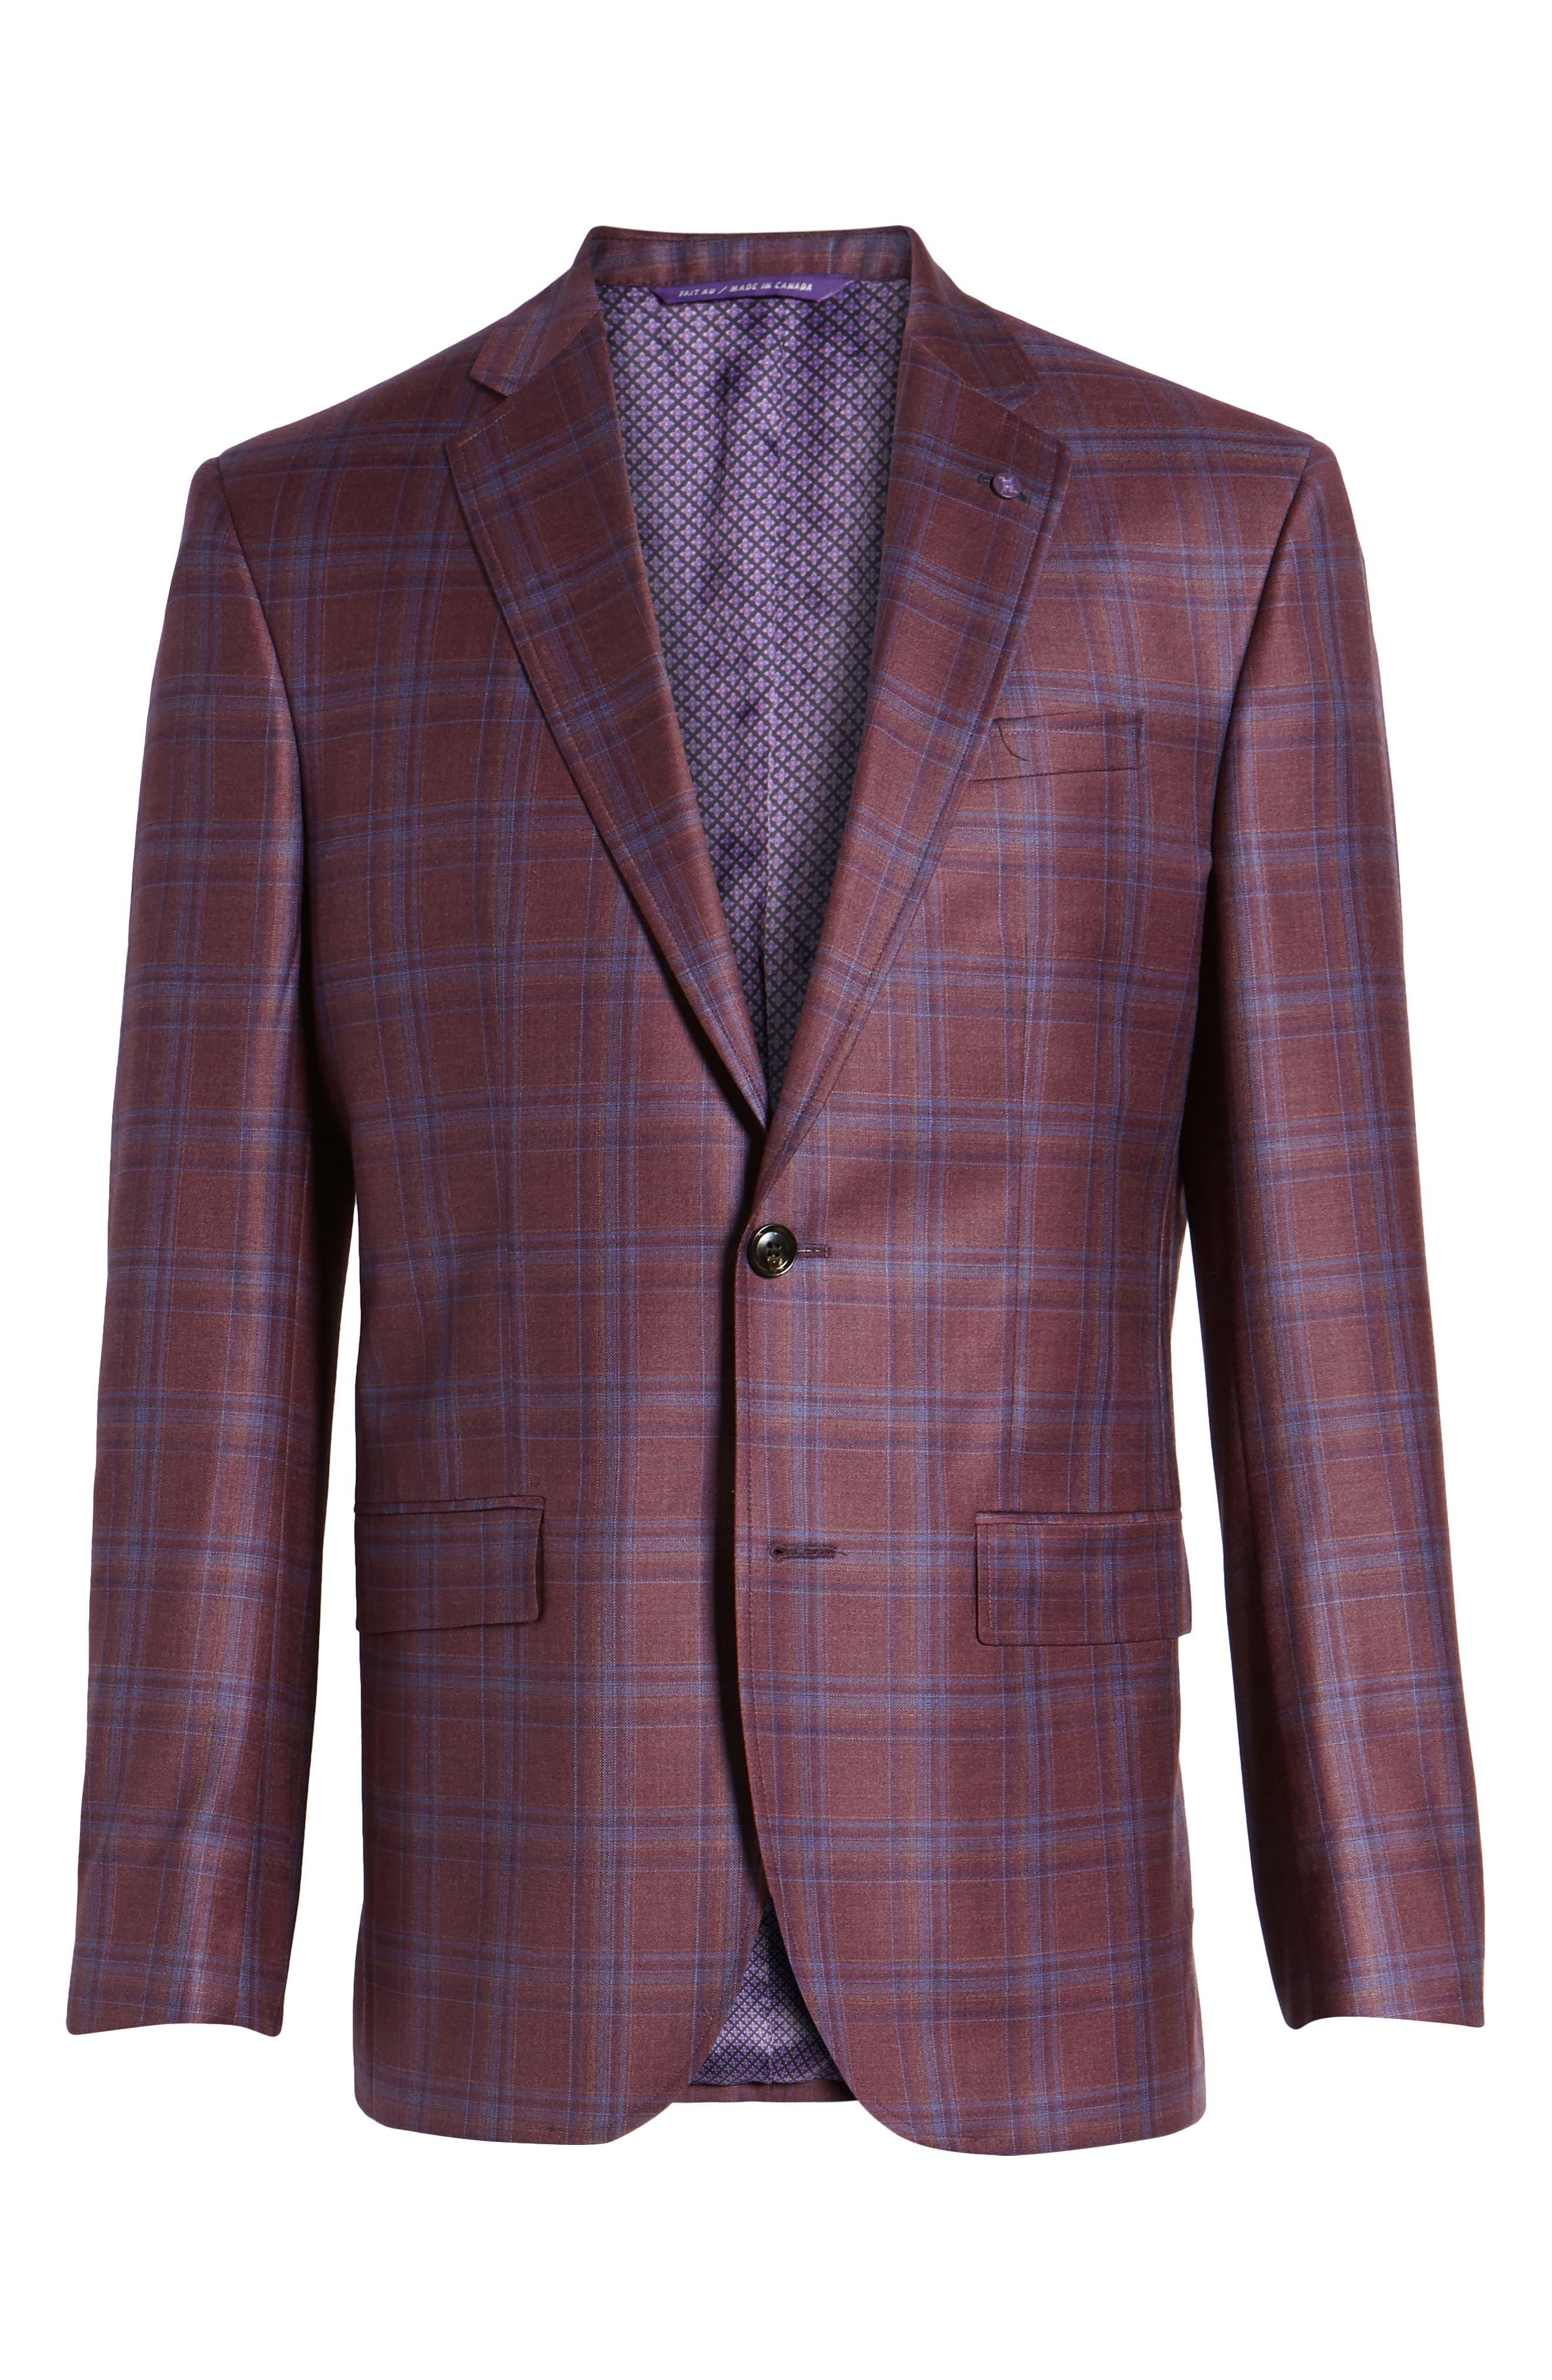 Jay Trim Fit Plaid Wool Sport Coat,                             Alternate thumbnail 6, color,                             Red